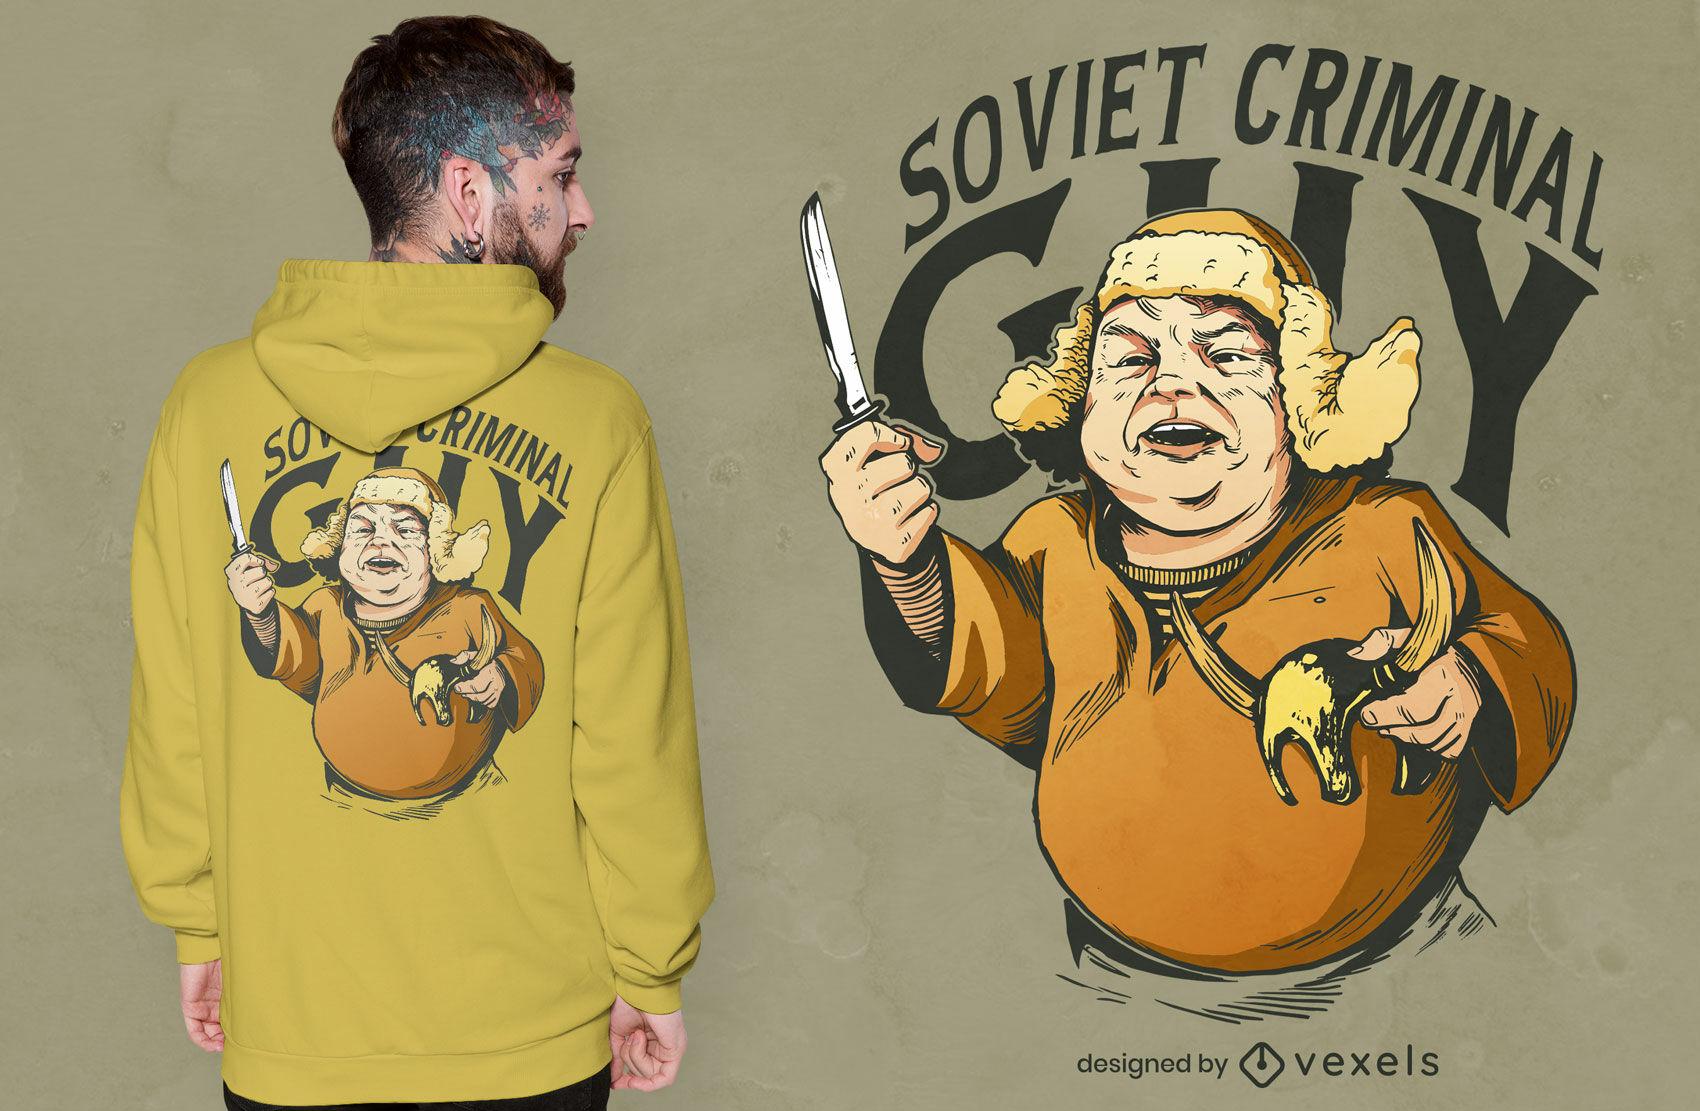 Criminal soviético con diseño de camiseta de cuchillo.